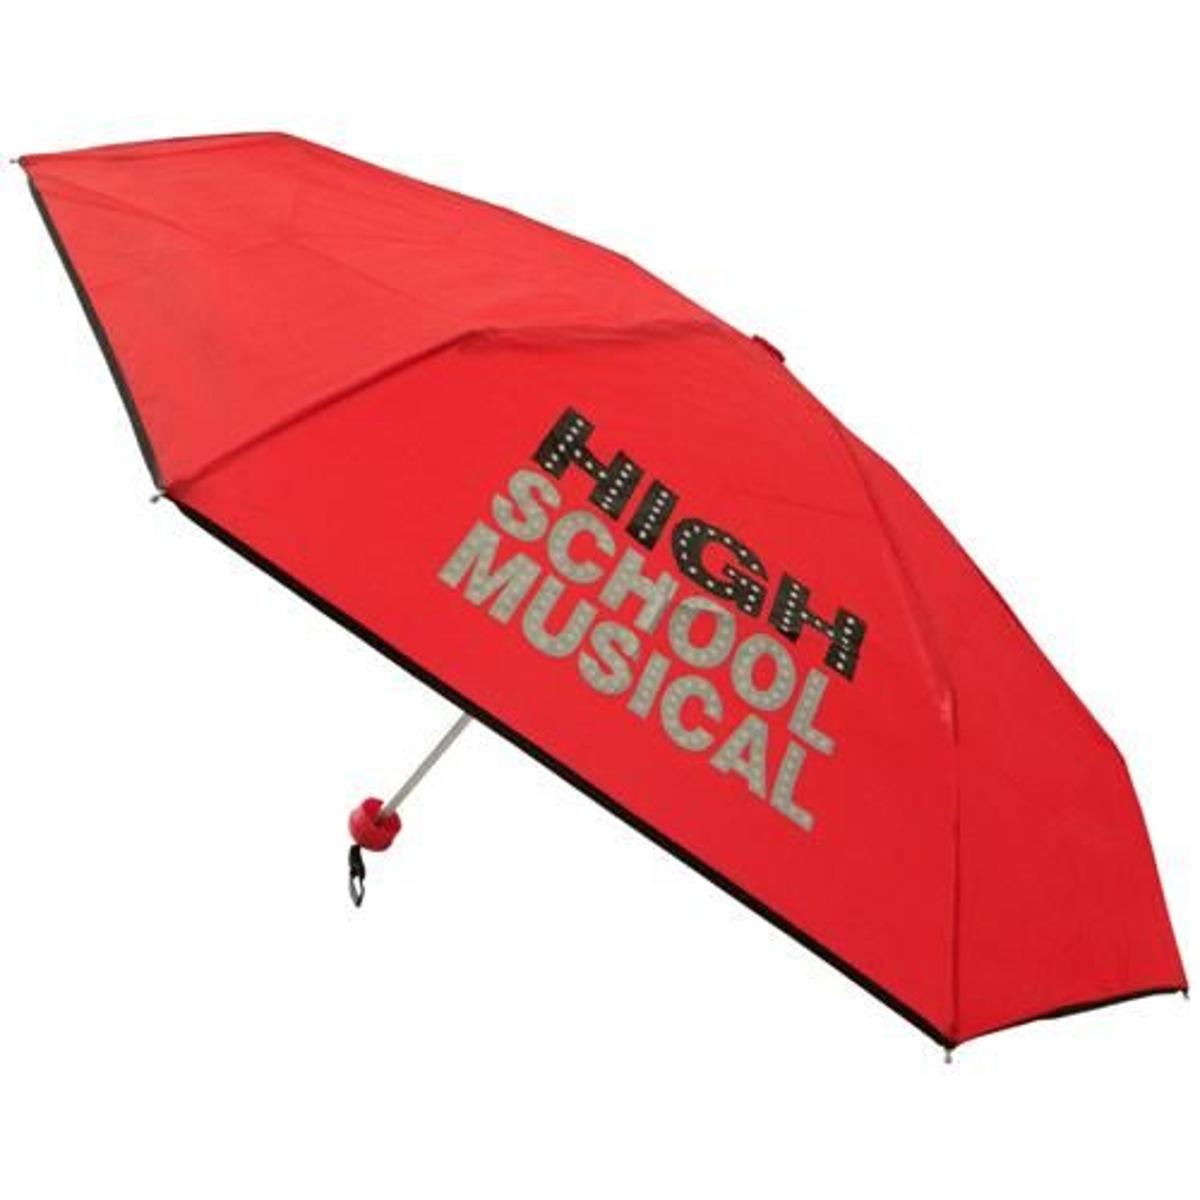 Parapluie High School Musical rouge